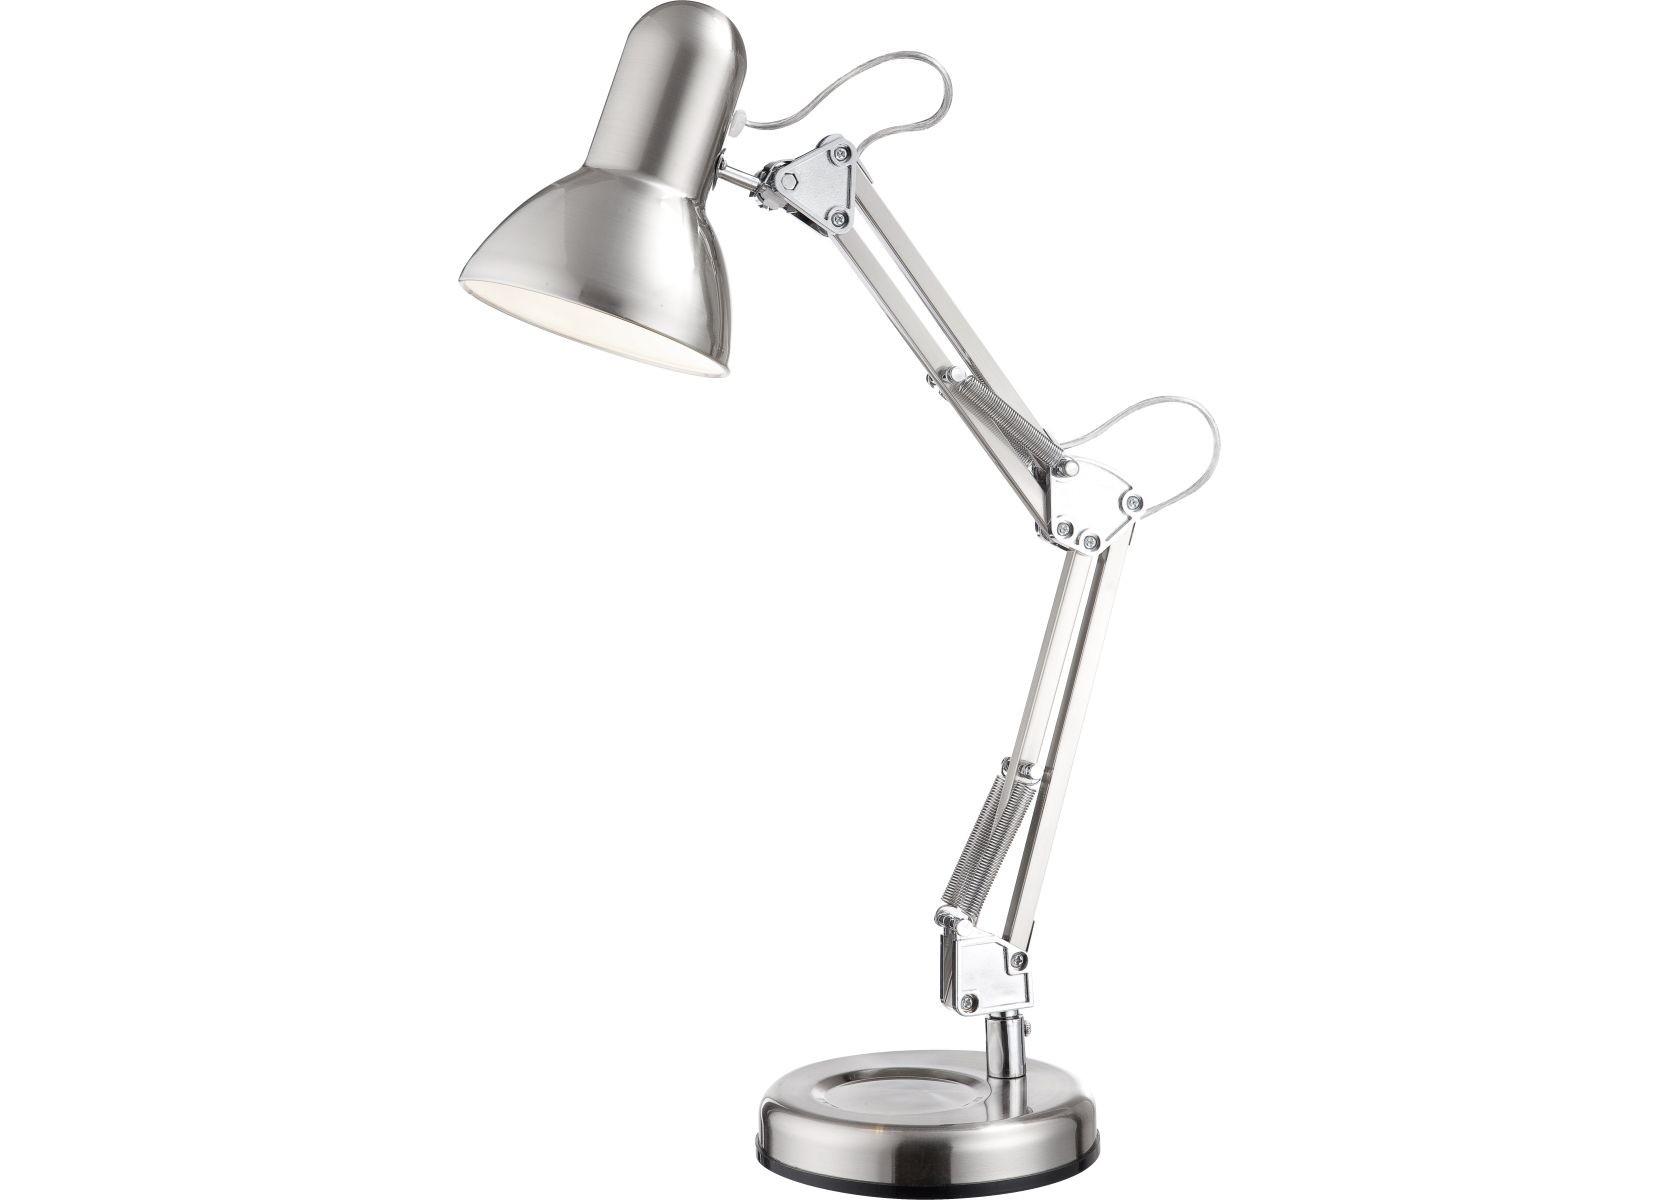 Настольная лампаНастольные лампы<br>&amp;lt;div&amp;gt;Вид цоколя: E27&amp;lt;/div&amp;gt;&amp;lt;div&amp;gt;Мощность: 40W&amp;lt;/div&amp;gt;&amp;lt;div&amp;gt;Количество ламп: 1&amp;lt;/div&amp;gt;<br><br>Material: Пластик<br>Высота см: 59